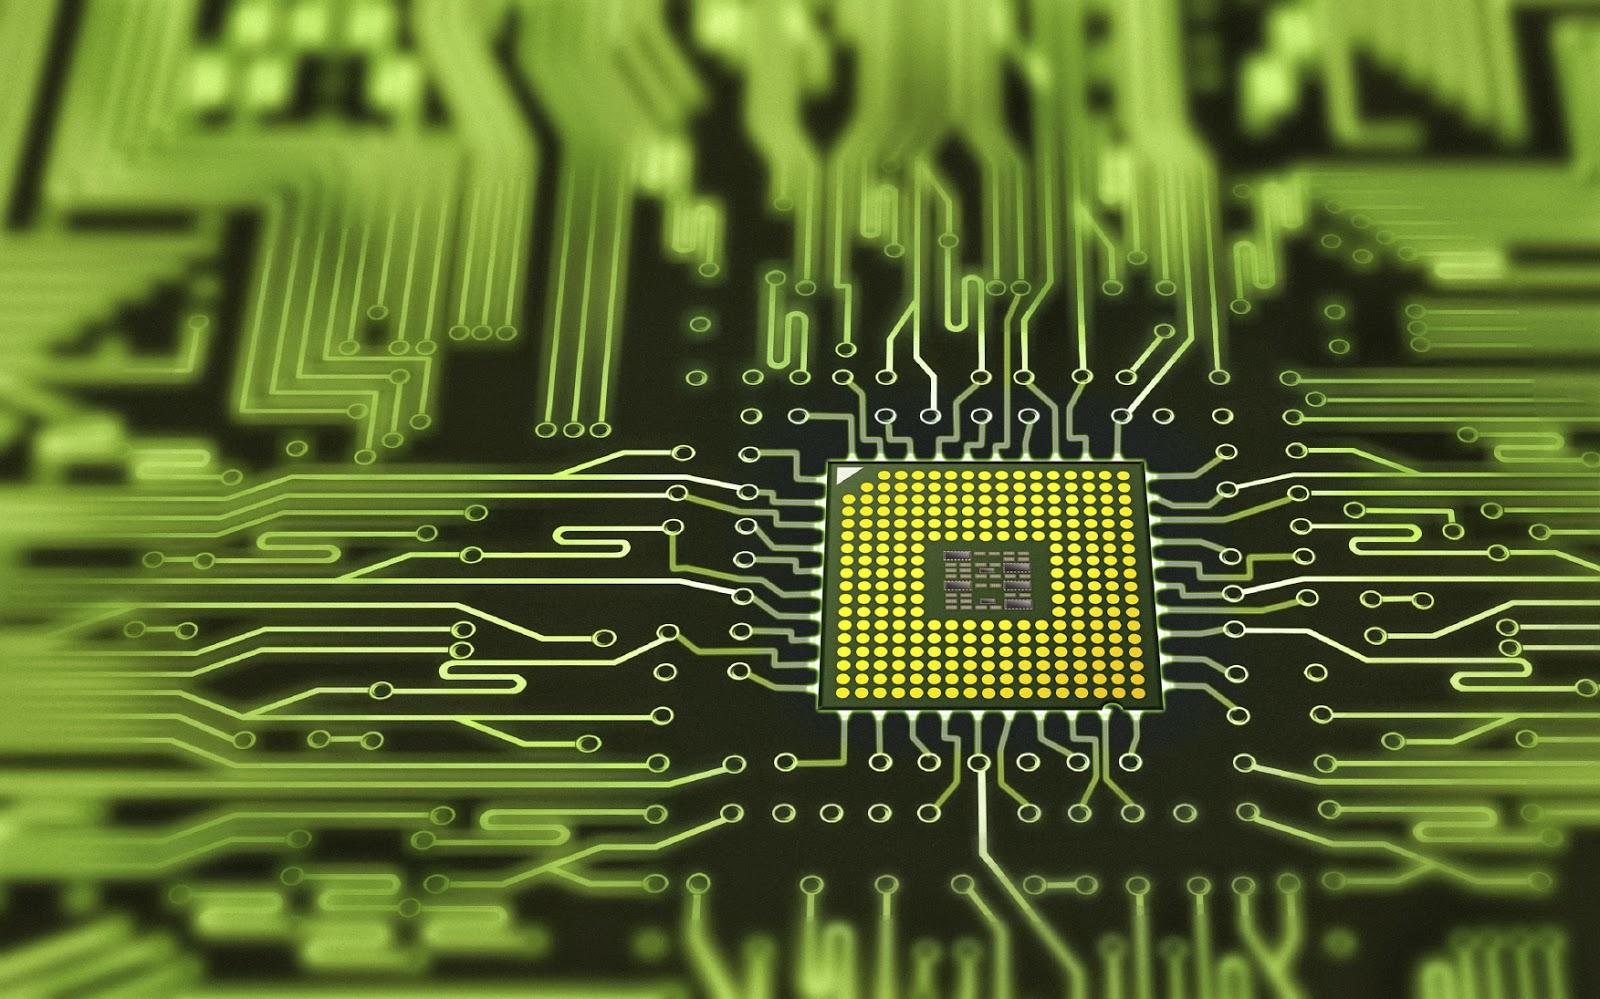 Pengertian Pcb Fiberglass Circuit Board